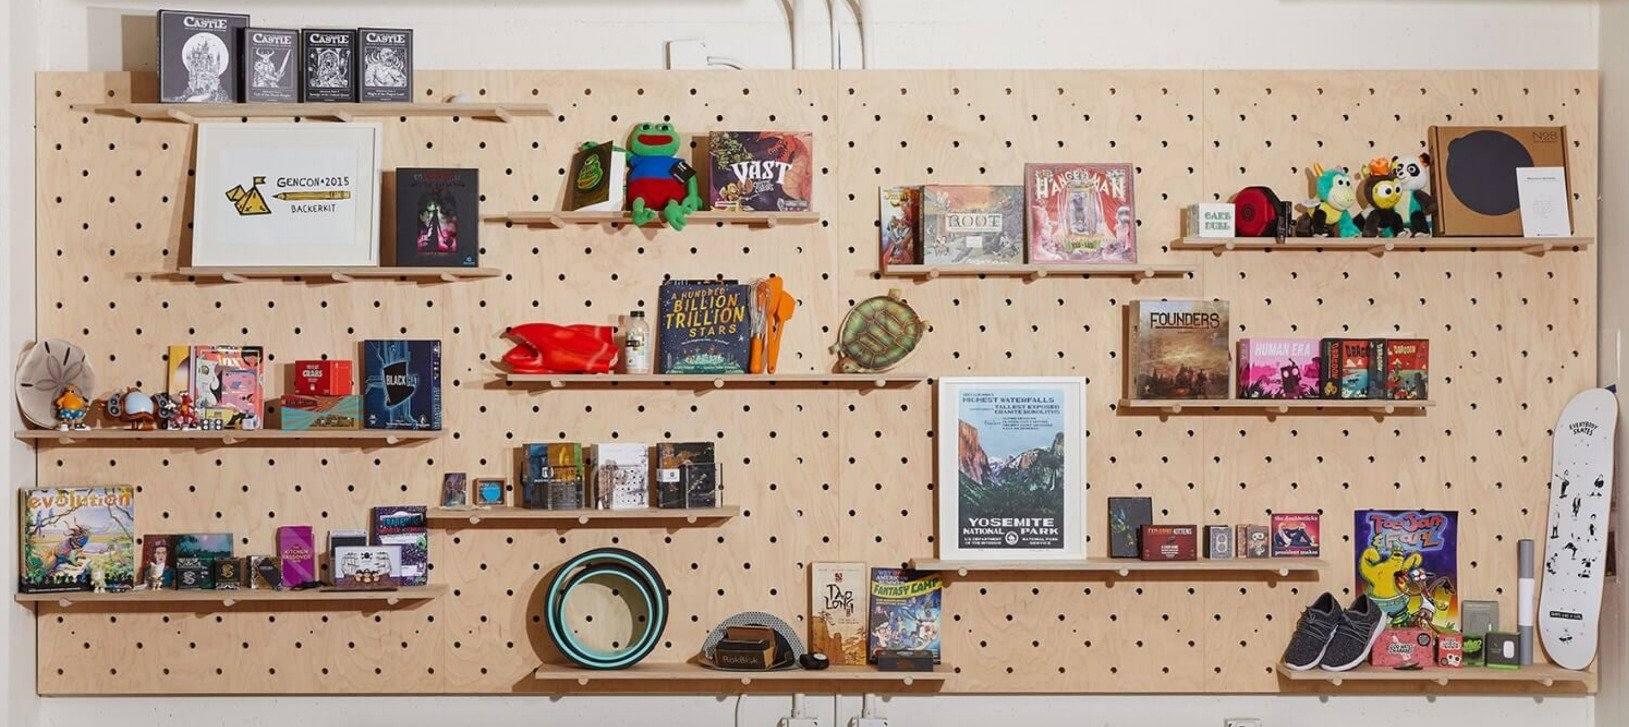 Backerkit items